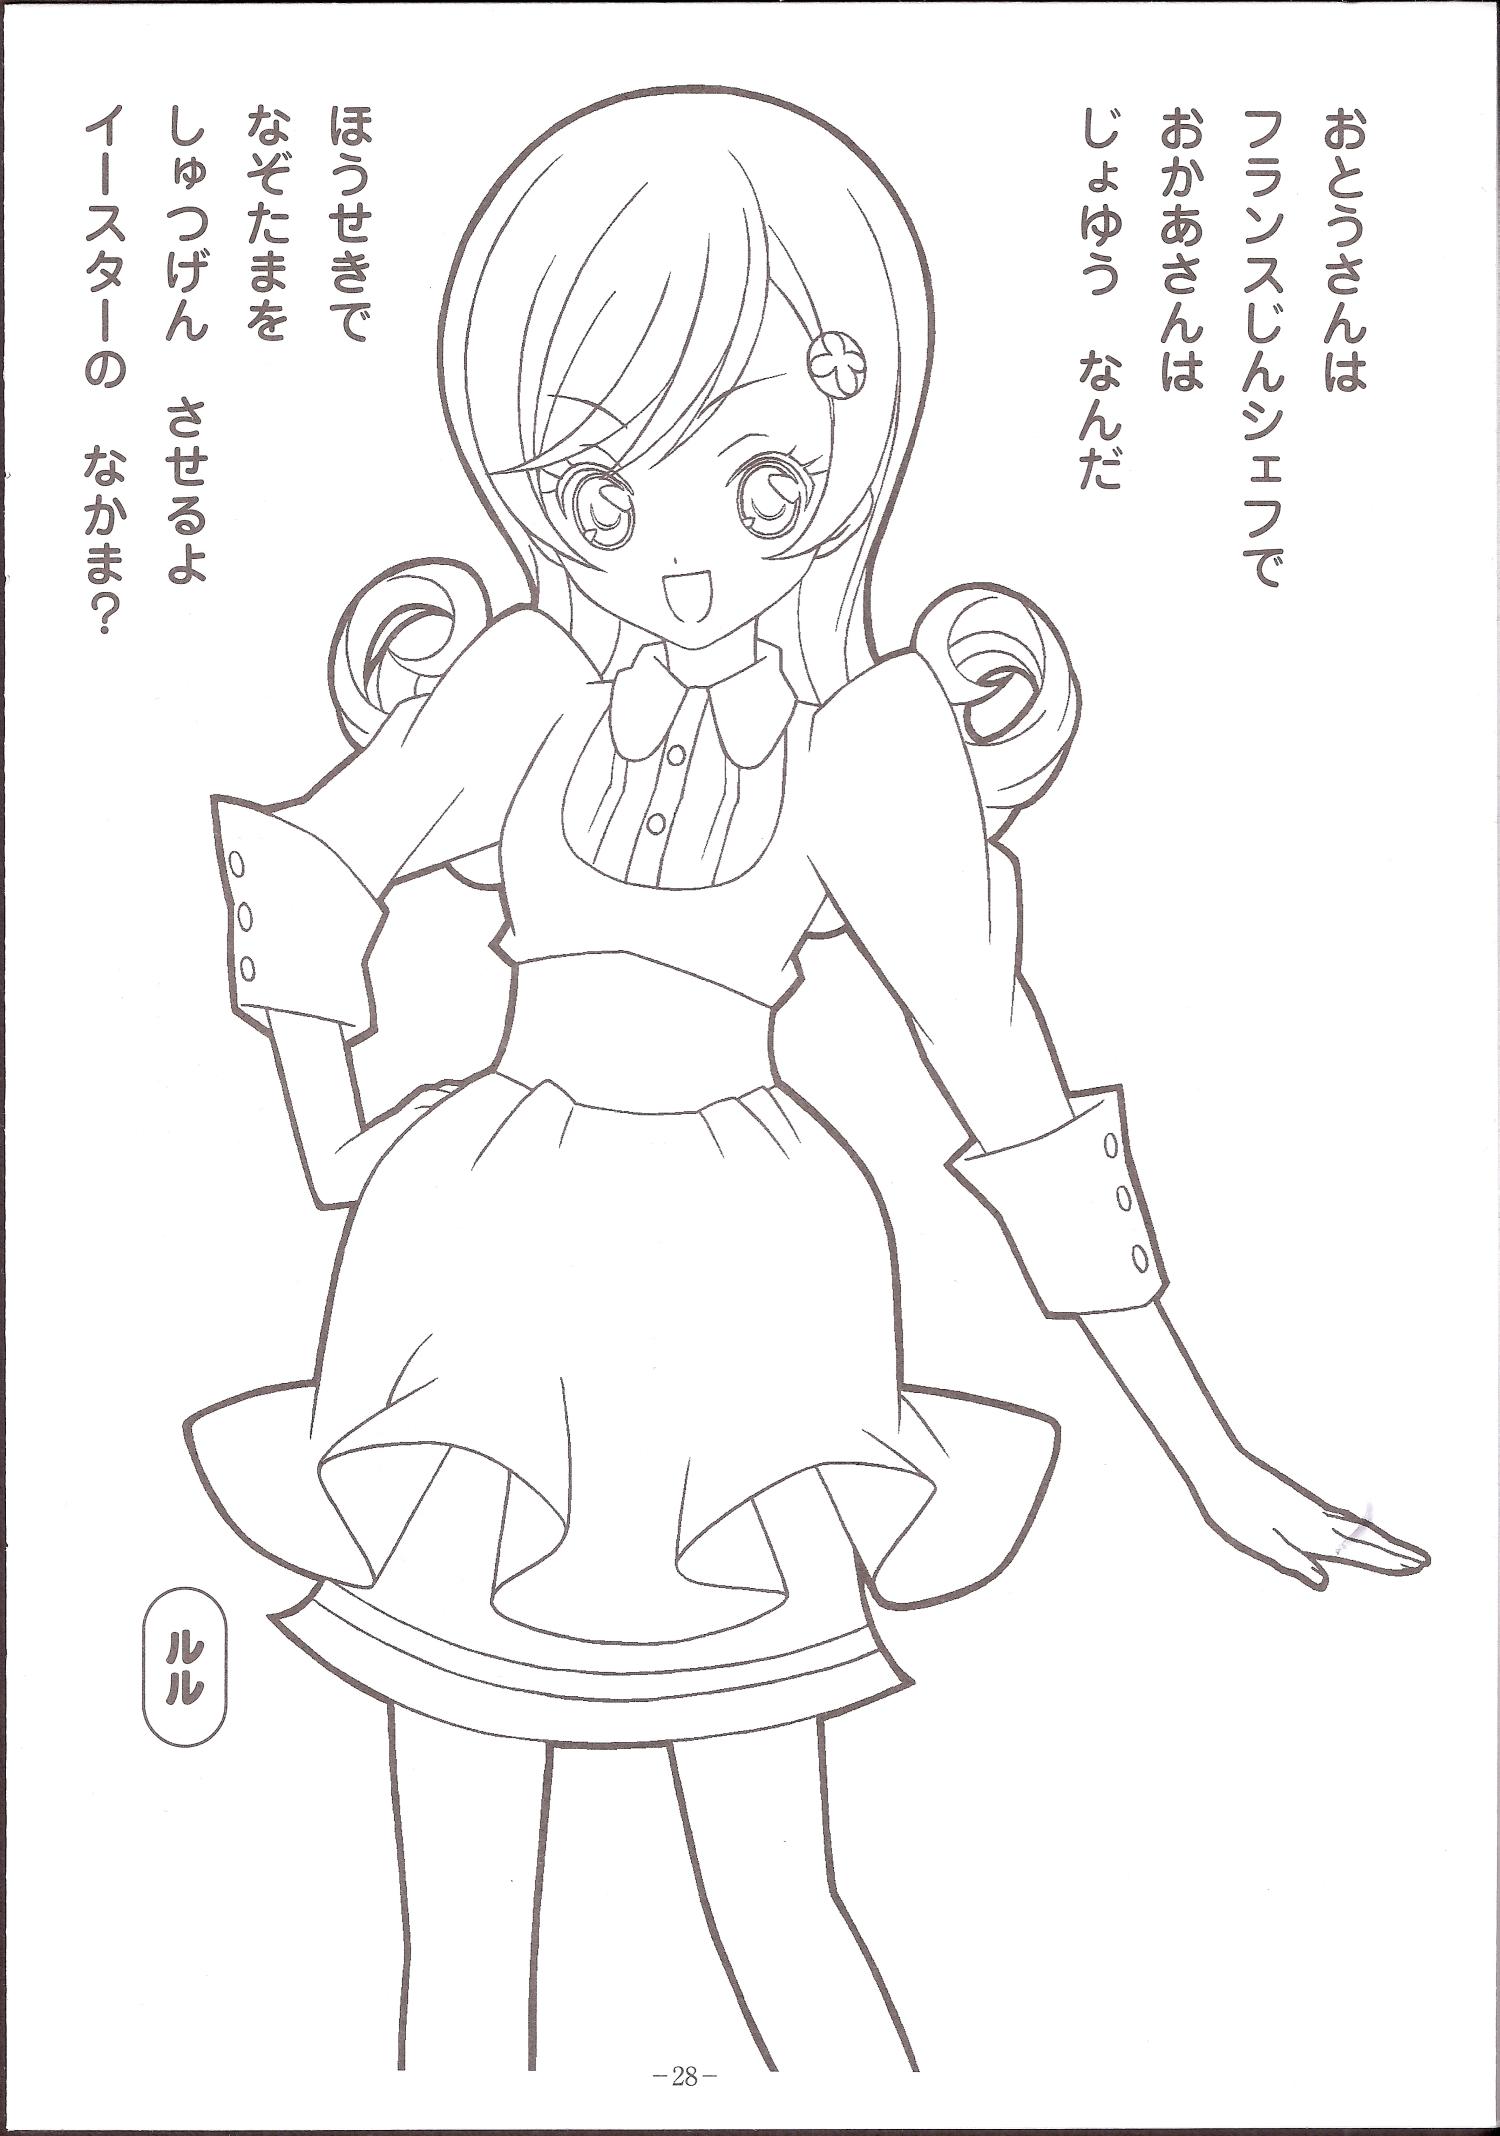 shugo chara coloring pages - photo#21